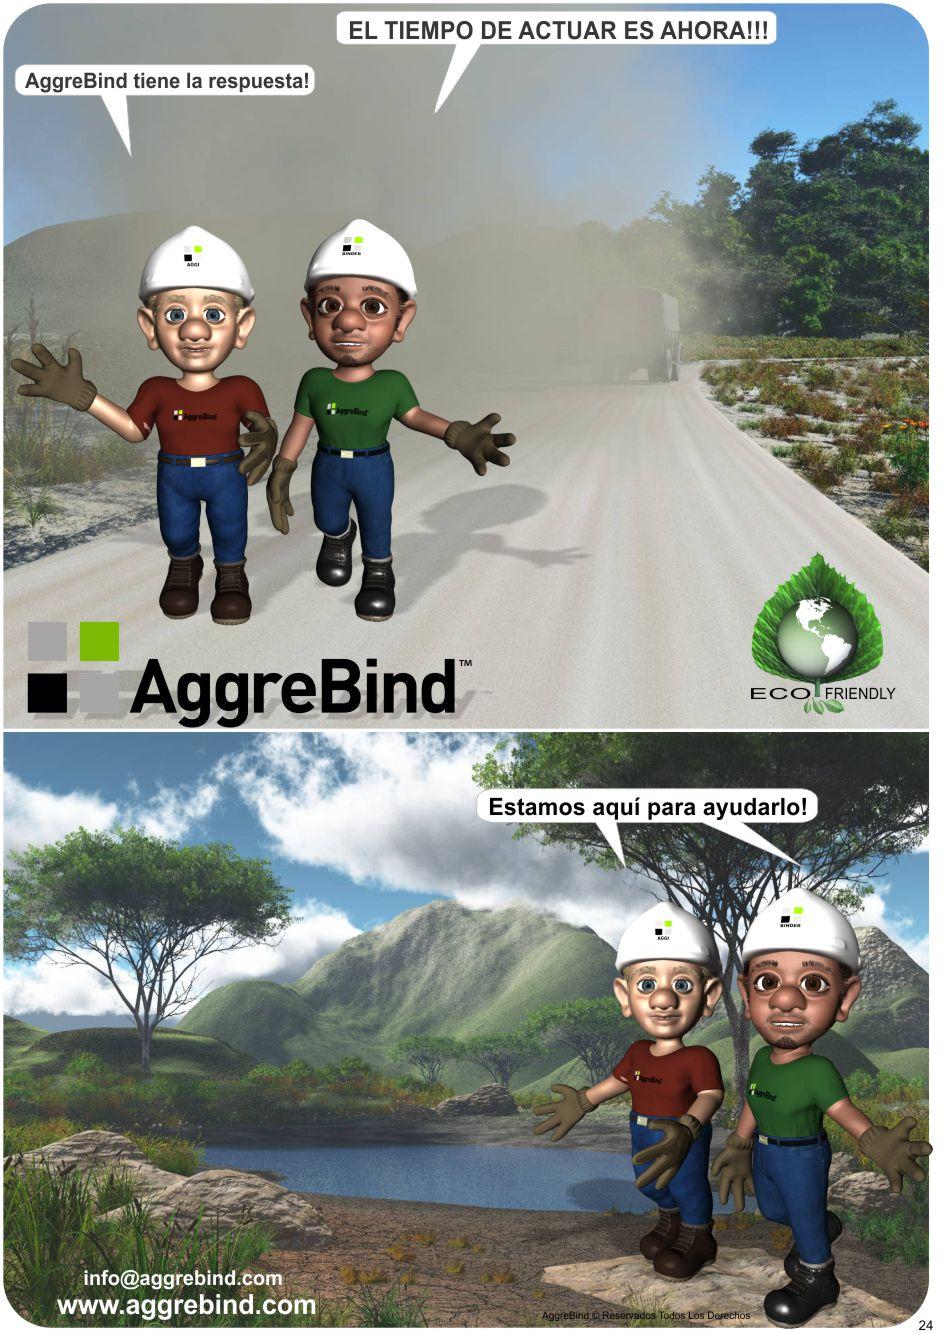 AggreBind Presentado por Aggi and Binder